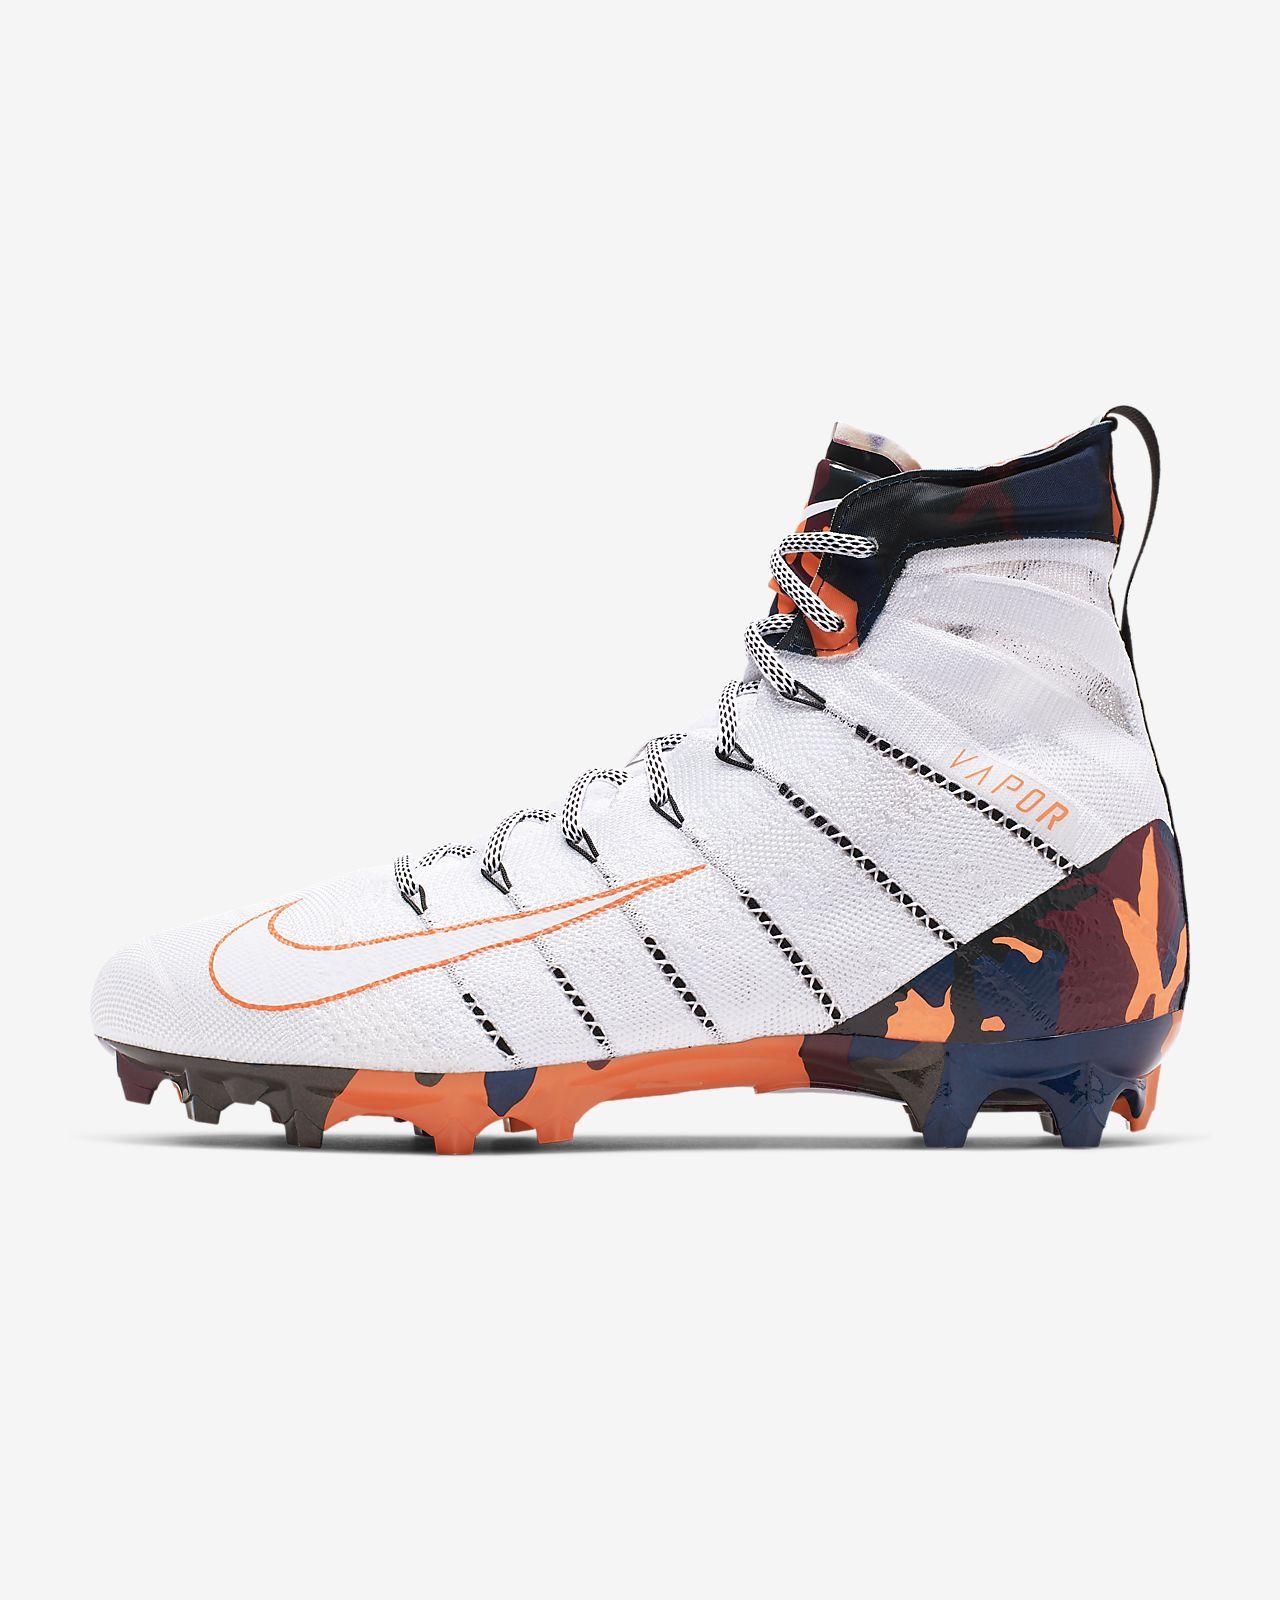 b4abe66959f Nike Vapor Untouchable 3 Elite Men's Football Cleat